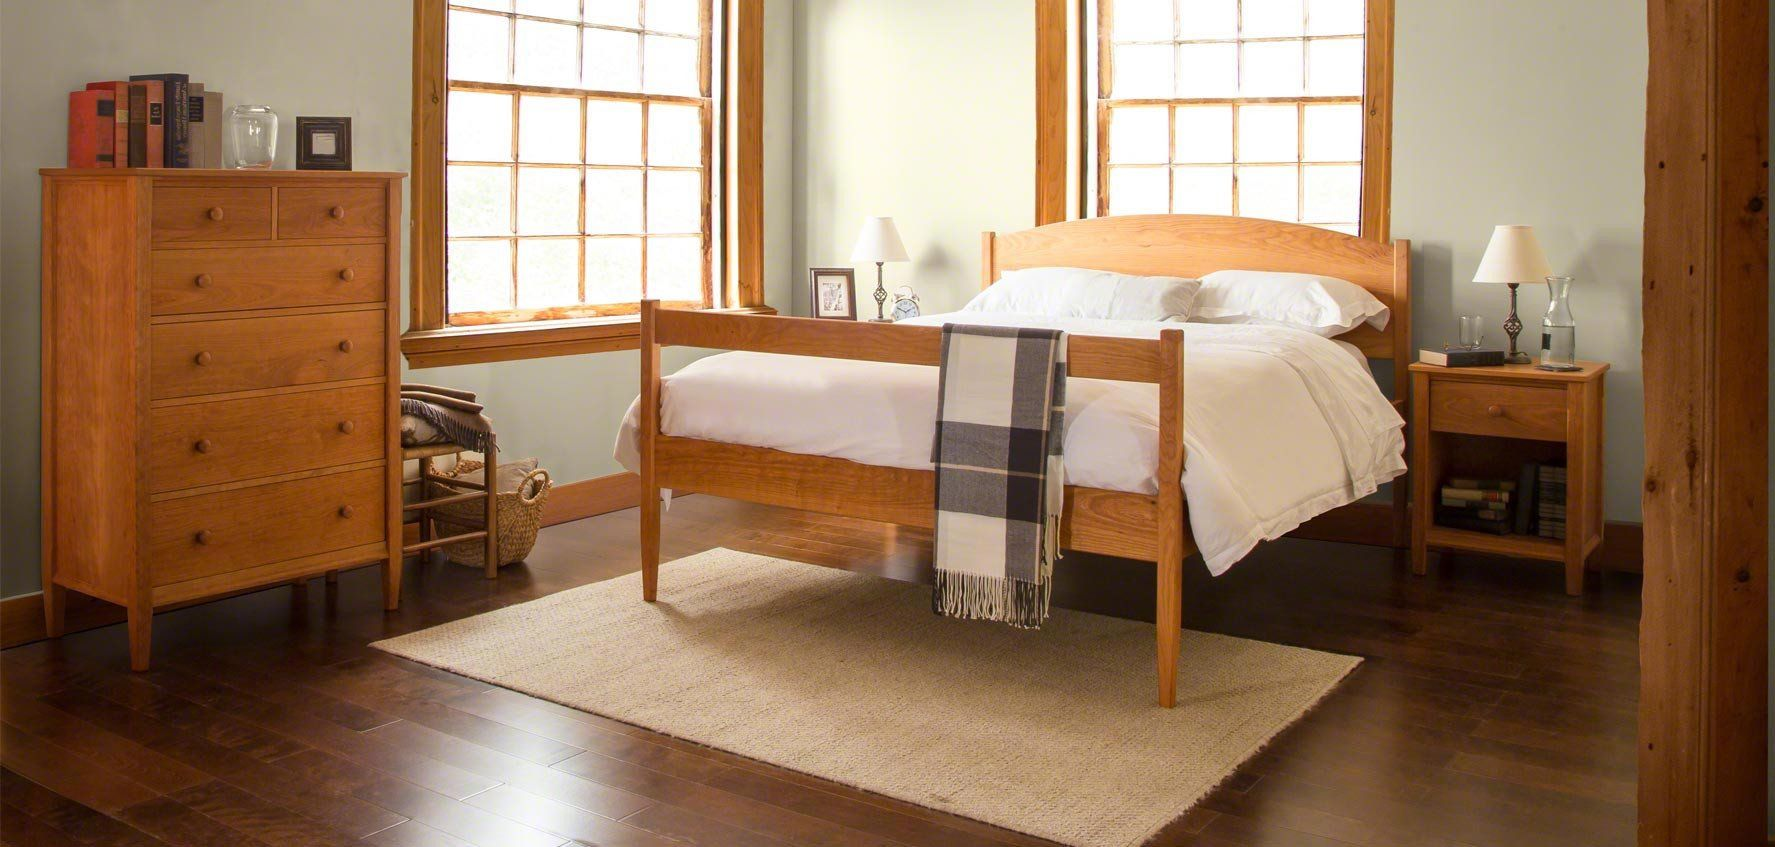 Wall Unit Bedroom Set Bedroom Furniture Plans Bedroom Furniture Wall Units Solid In 2020 Bedroom Wall Units Bedroom Set Bedroom Set Designs